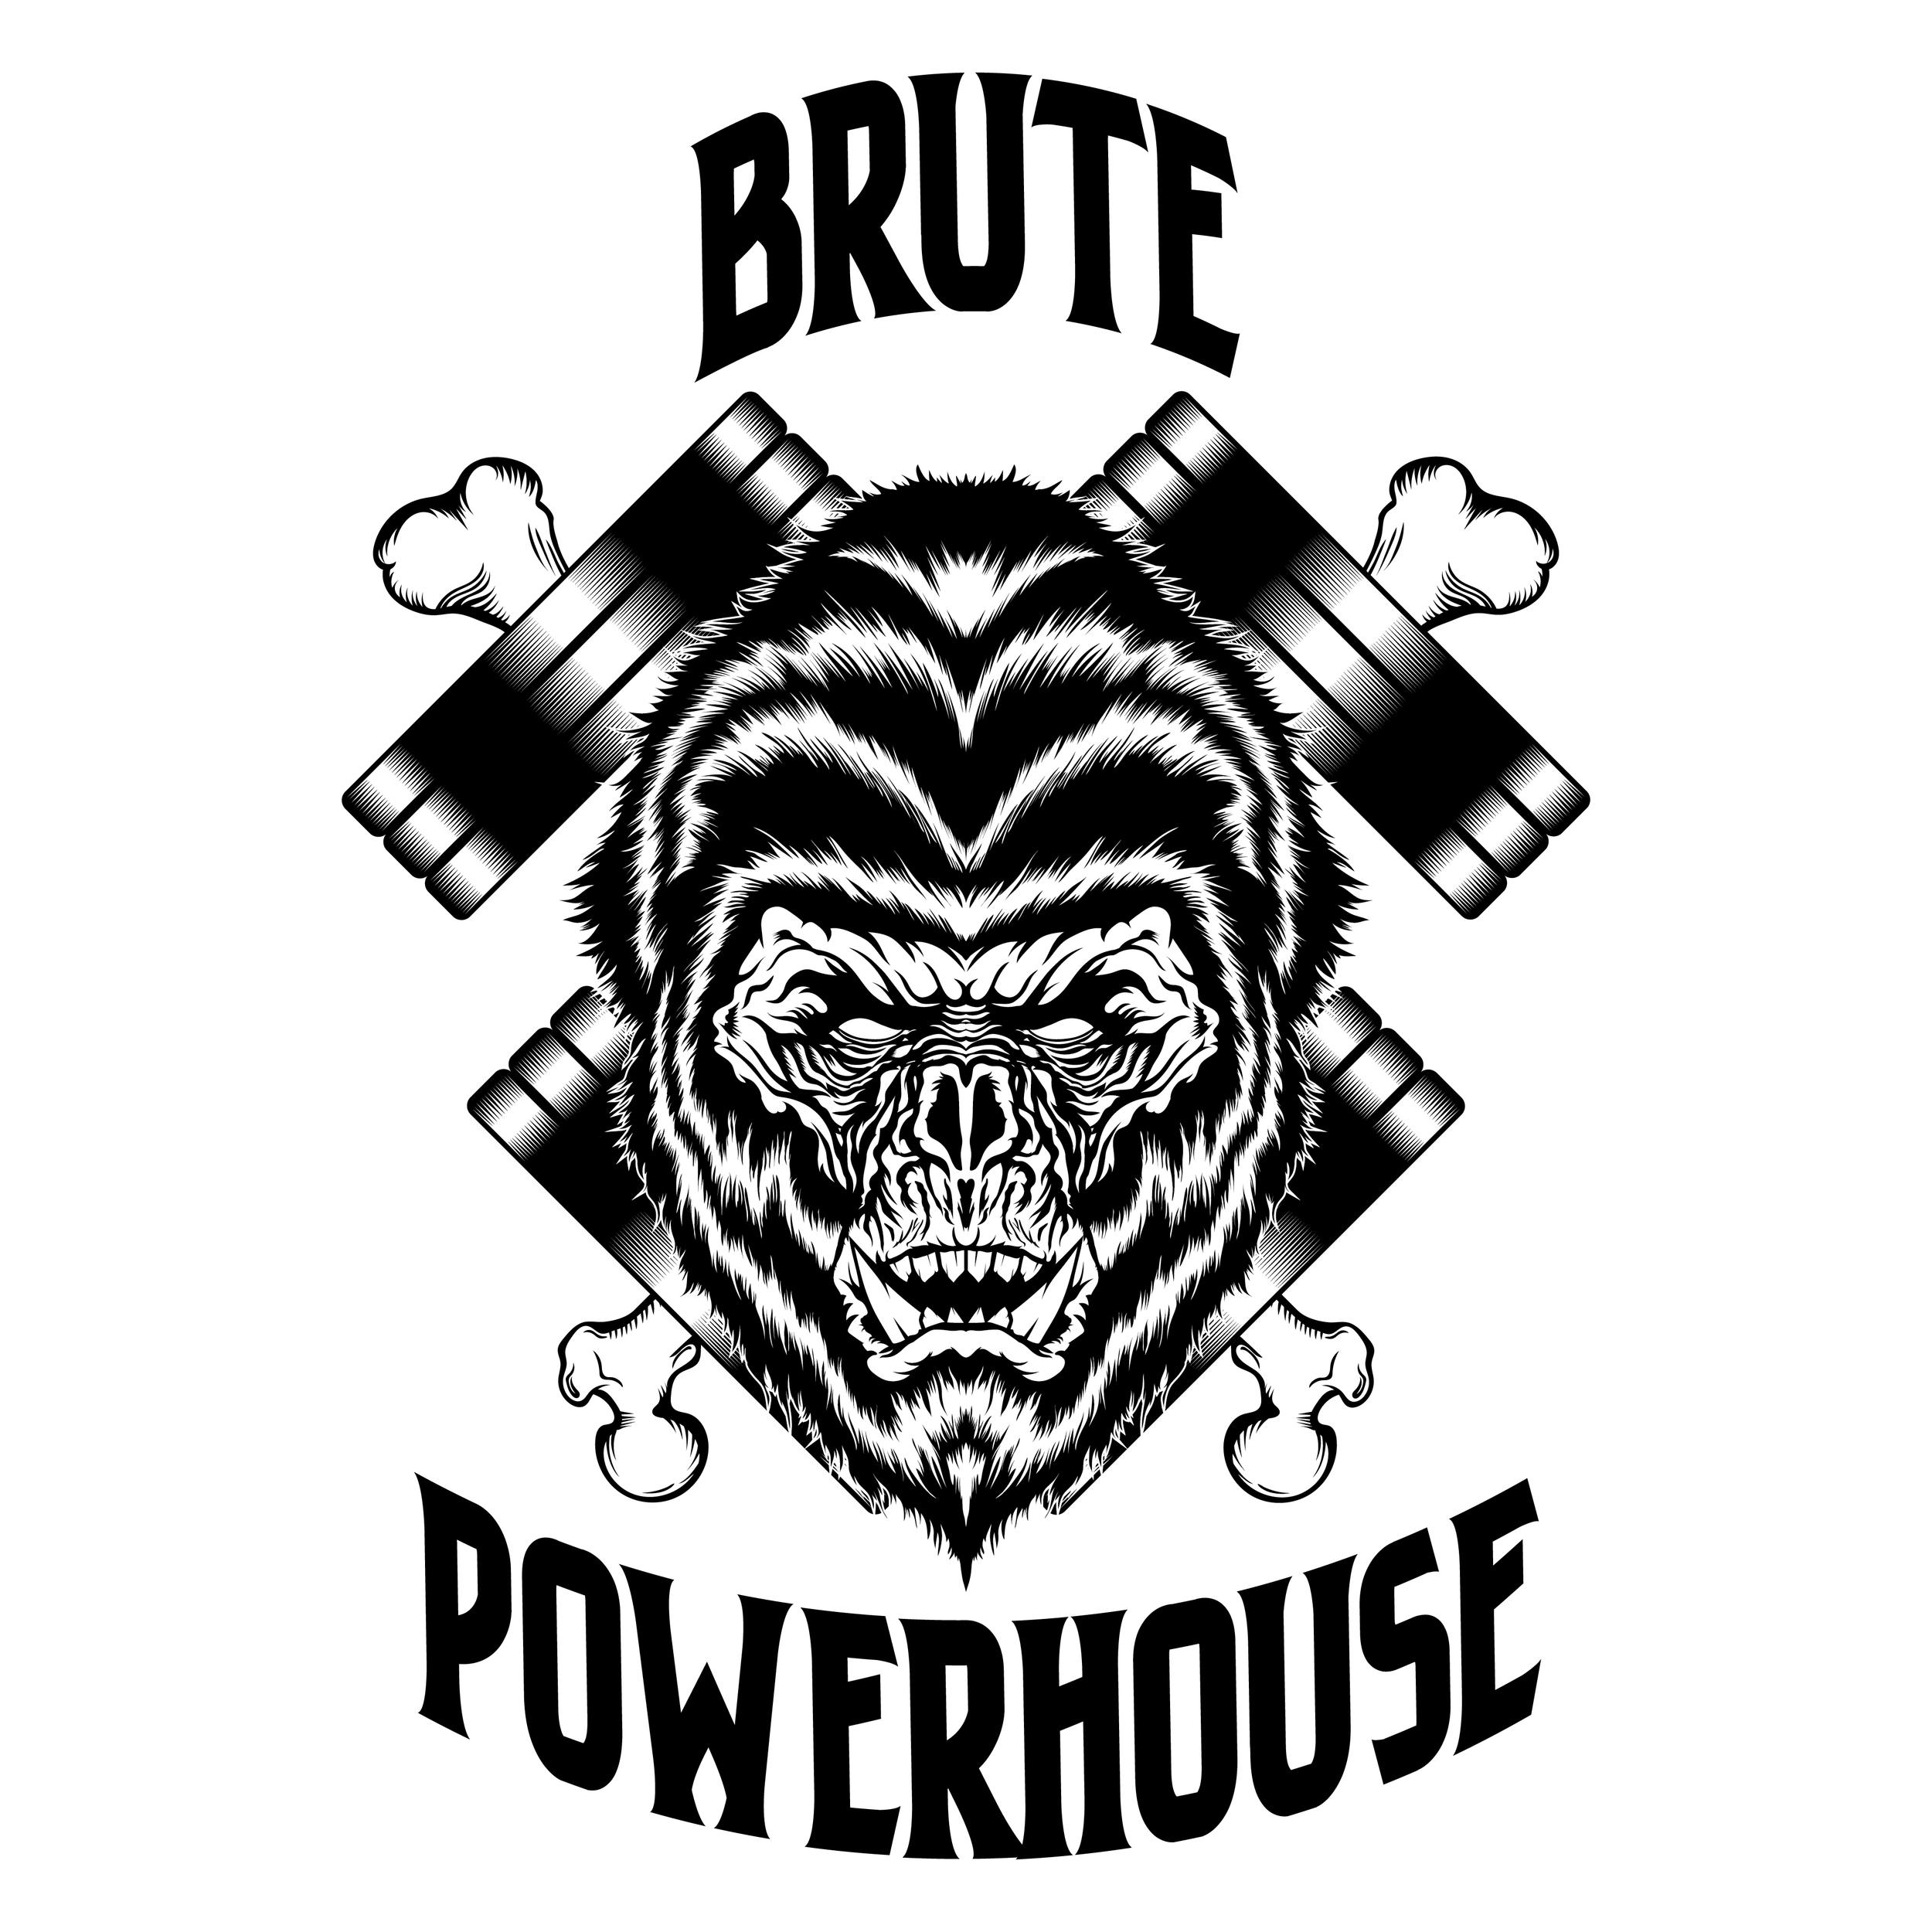 brute-powerhouse-illustration-logo-adobe-illustrator-vector-art-artist-gorilla-monster-ape-savage-gym-crossfit-powerlifting-roberto-orozco-design-graphic-designer-black-white-crosbones.jpg